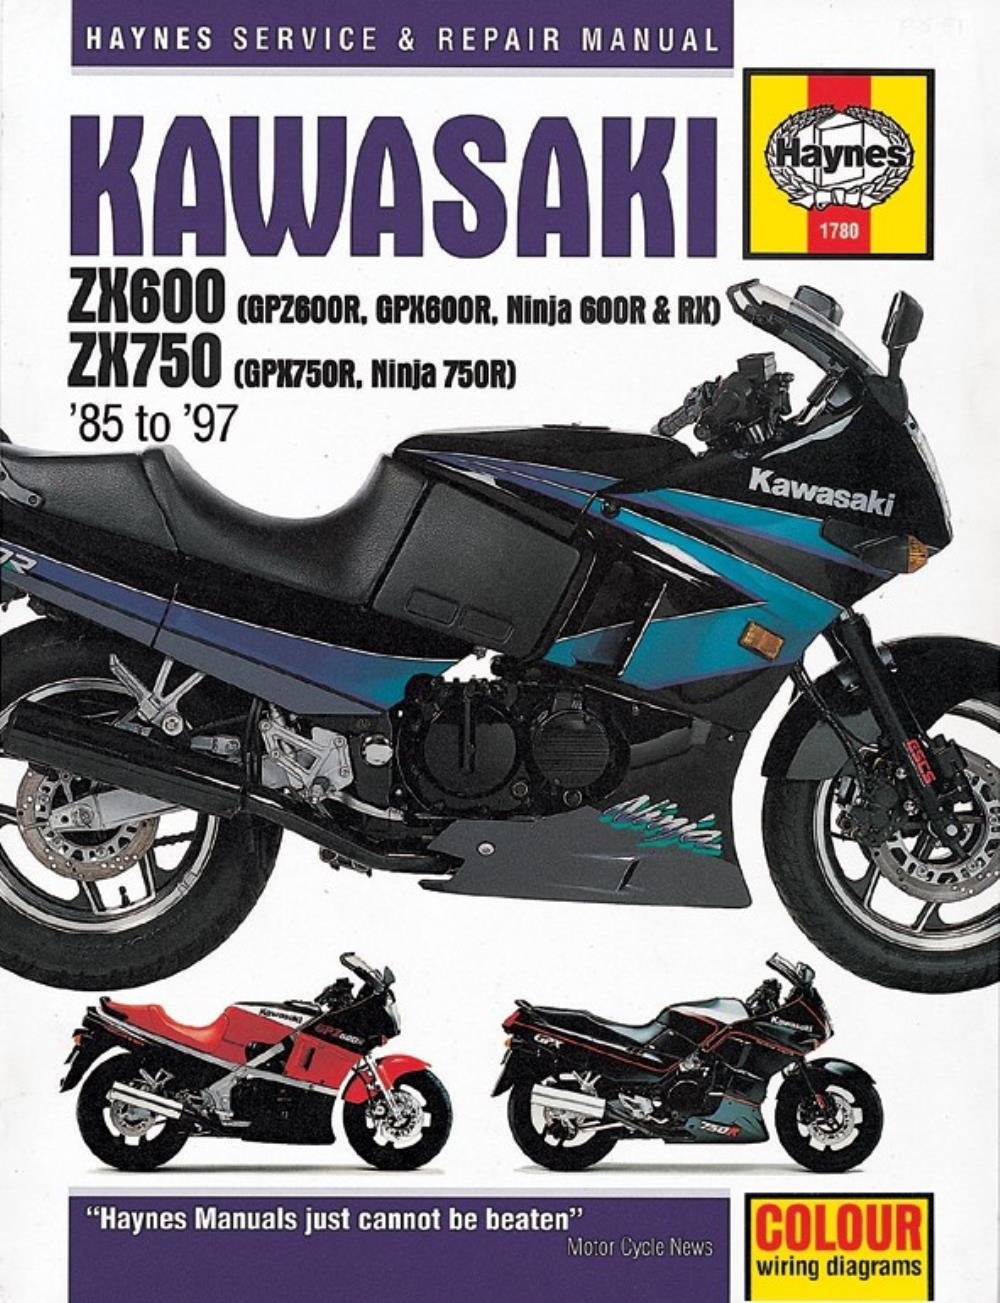 Wiring Diagram 1986 Kawasaki Ninja Zx600r Library Engine Manual Haynes For Gpz 600 R Zx600a2